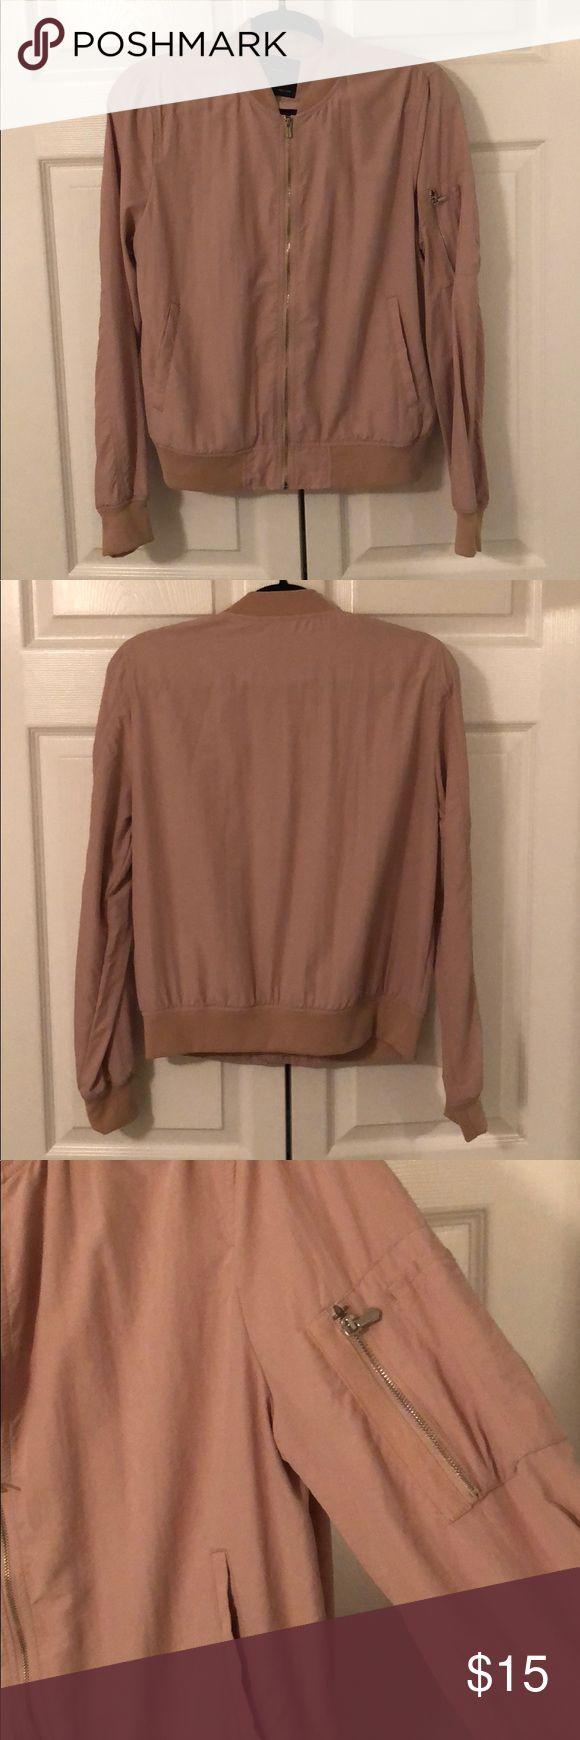 Zara Pink Bomber Jacket Zara Bomber Jacket in a light pink color. Very lightweight. Worn a few times. Good condition. Zara Jackets & Coats